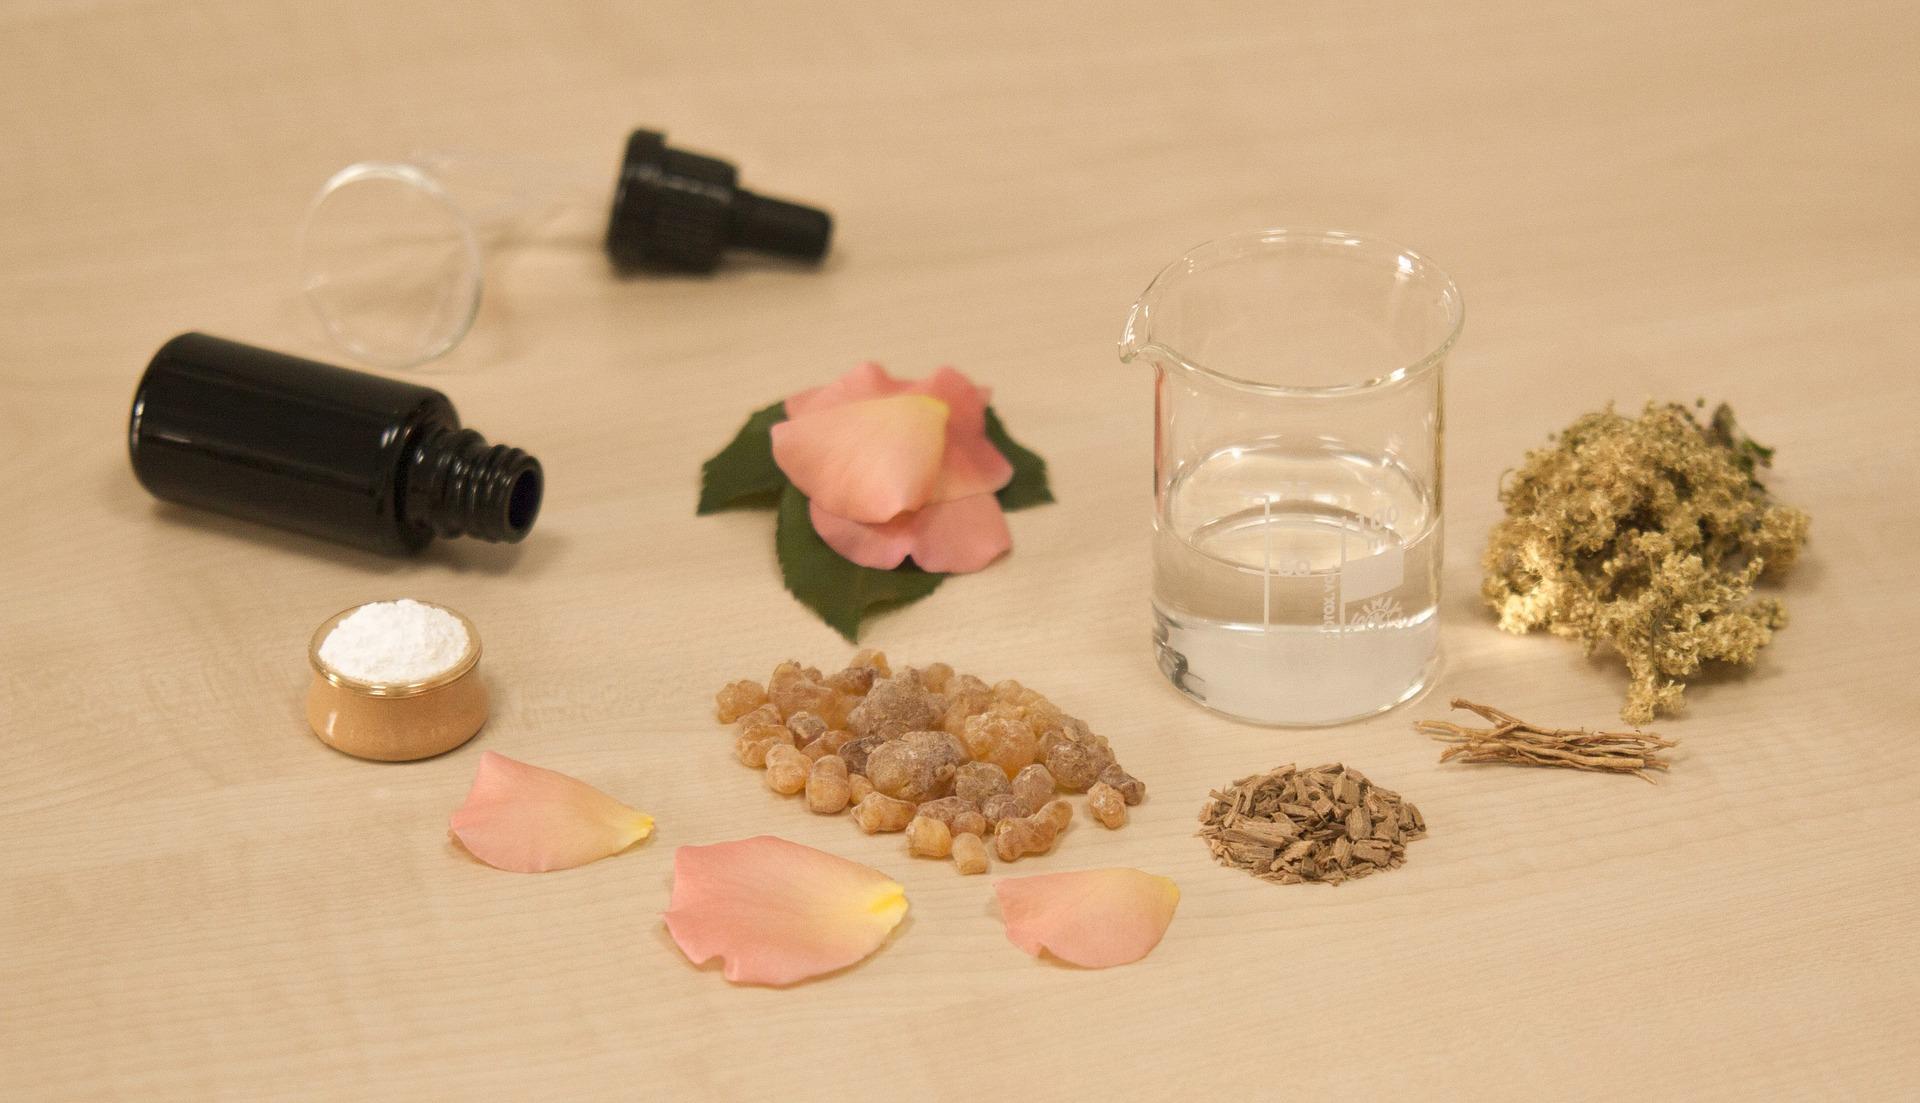 miros placut camera - aromaterapie - sfatulparintilor.ro - pixabay_com